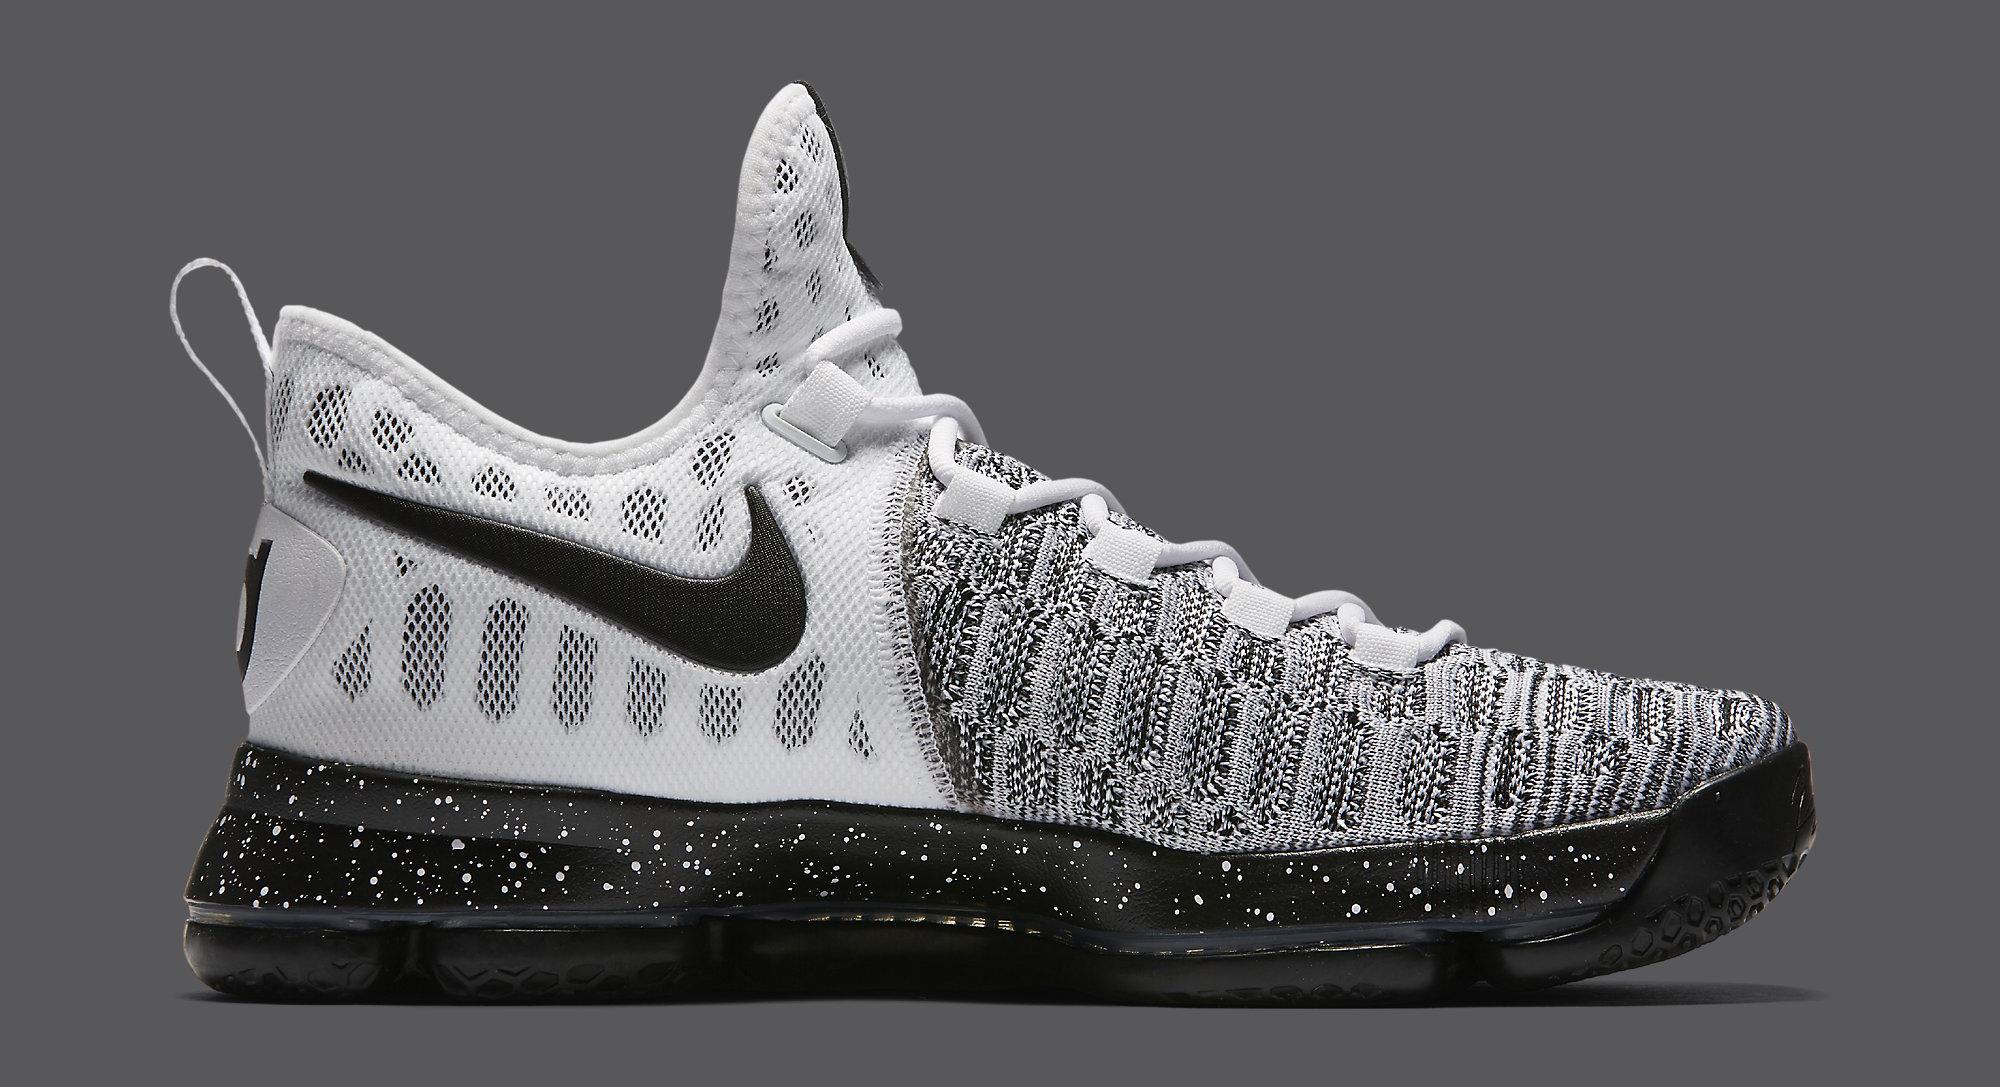 Nike KD 9 White Black Oreo 843392-100 Medial